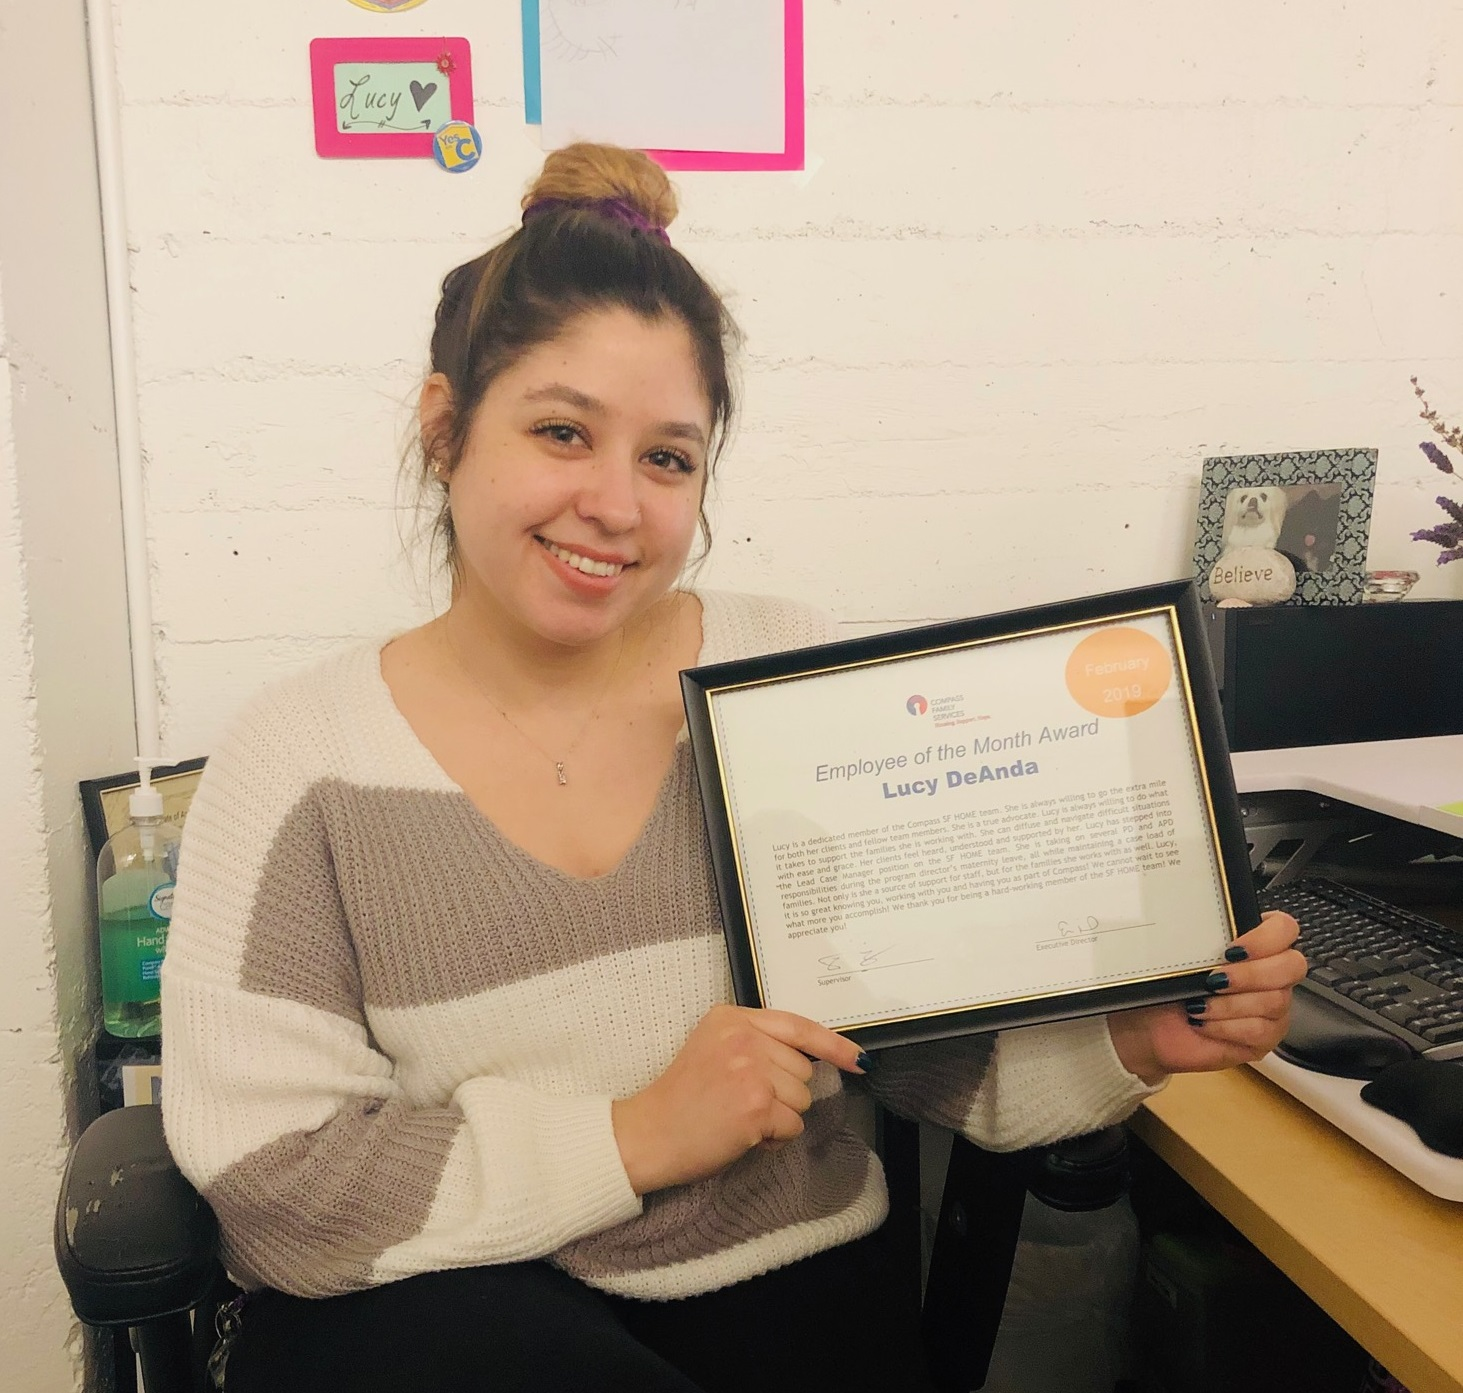 Lucy DeAnda - Congratulations!